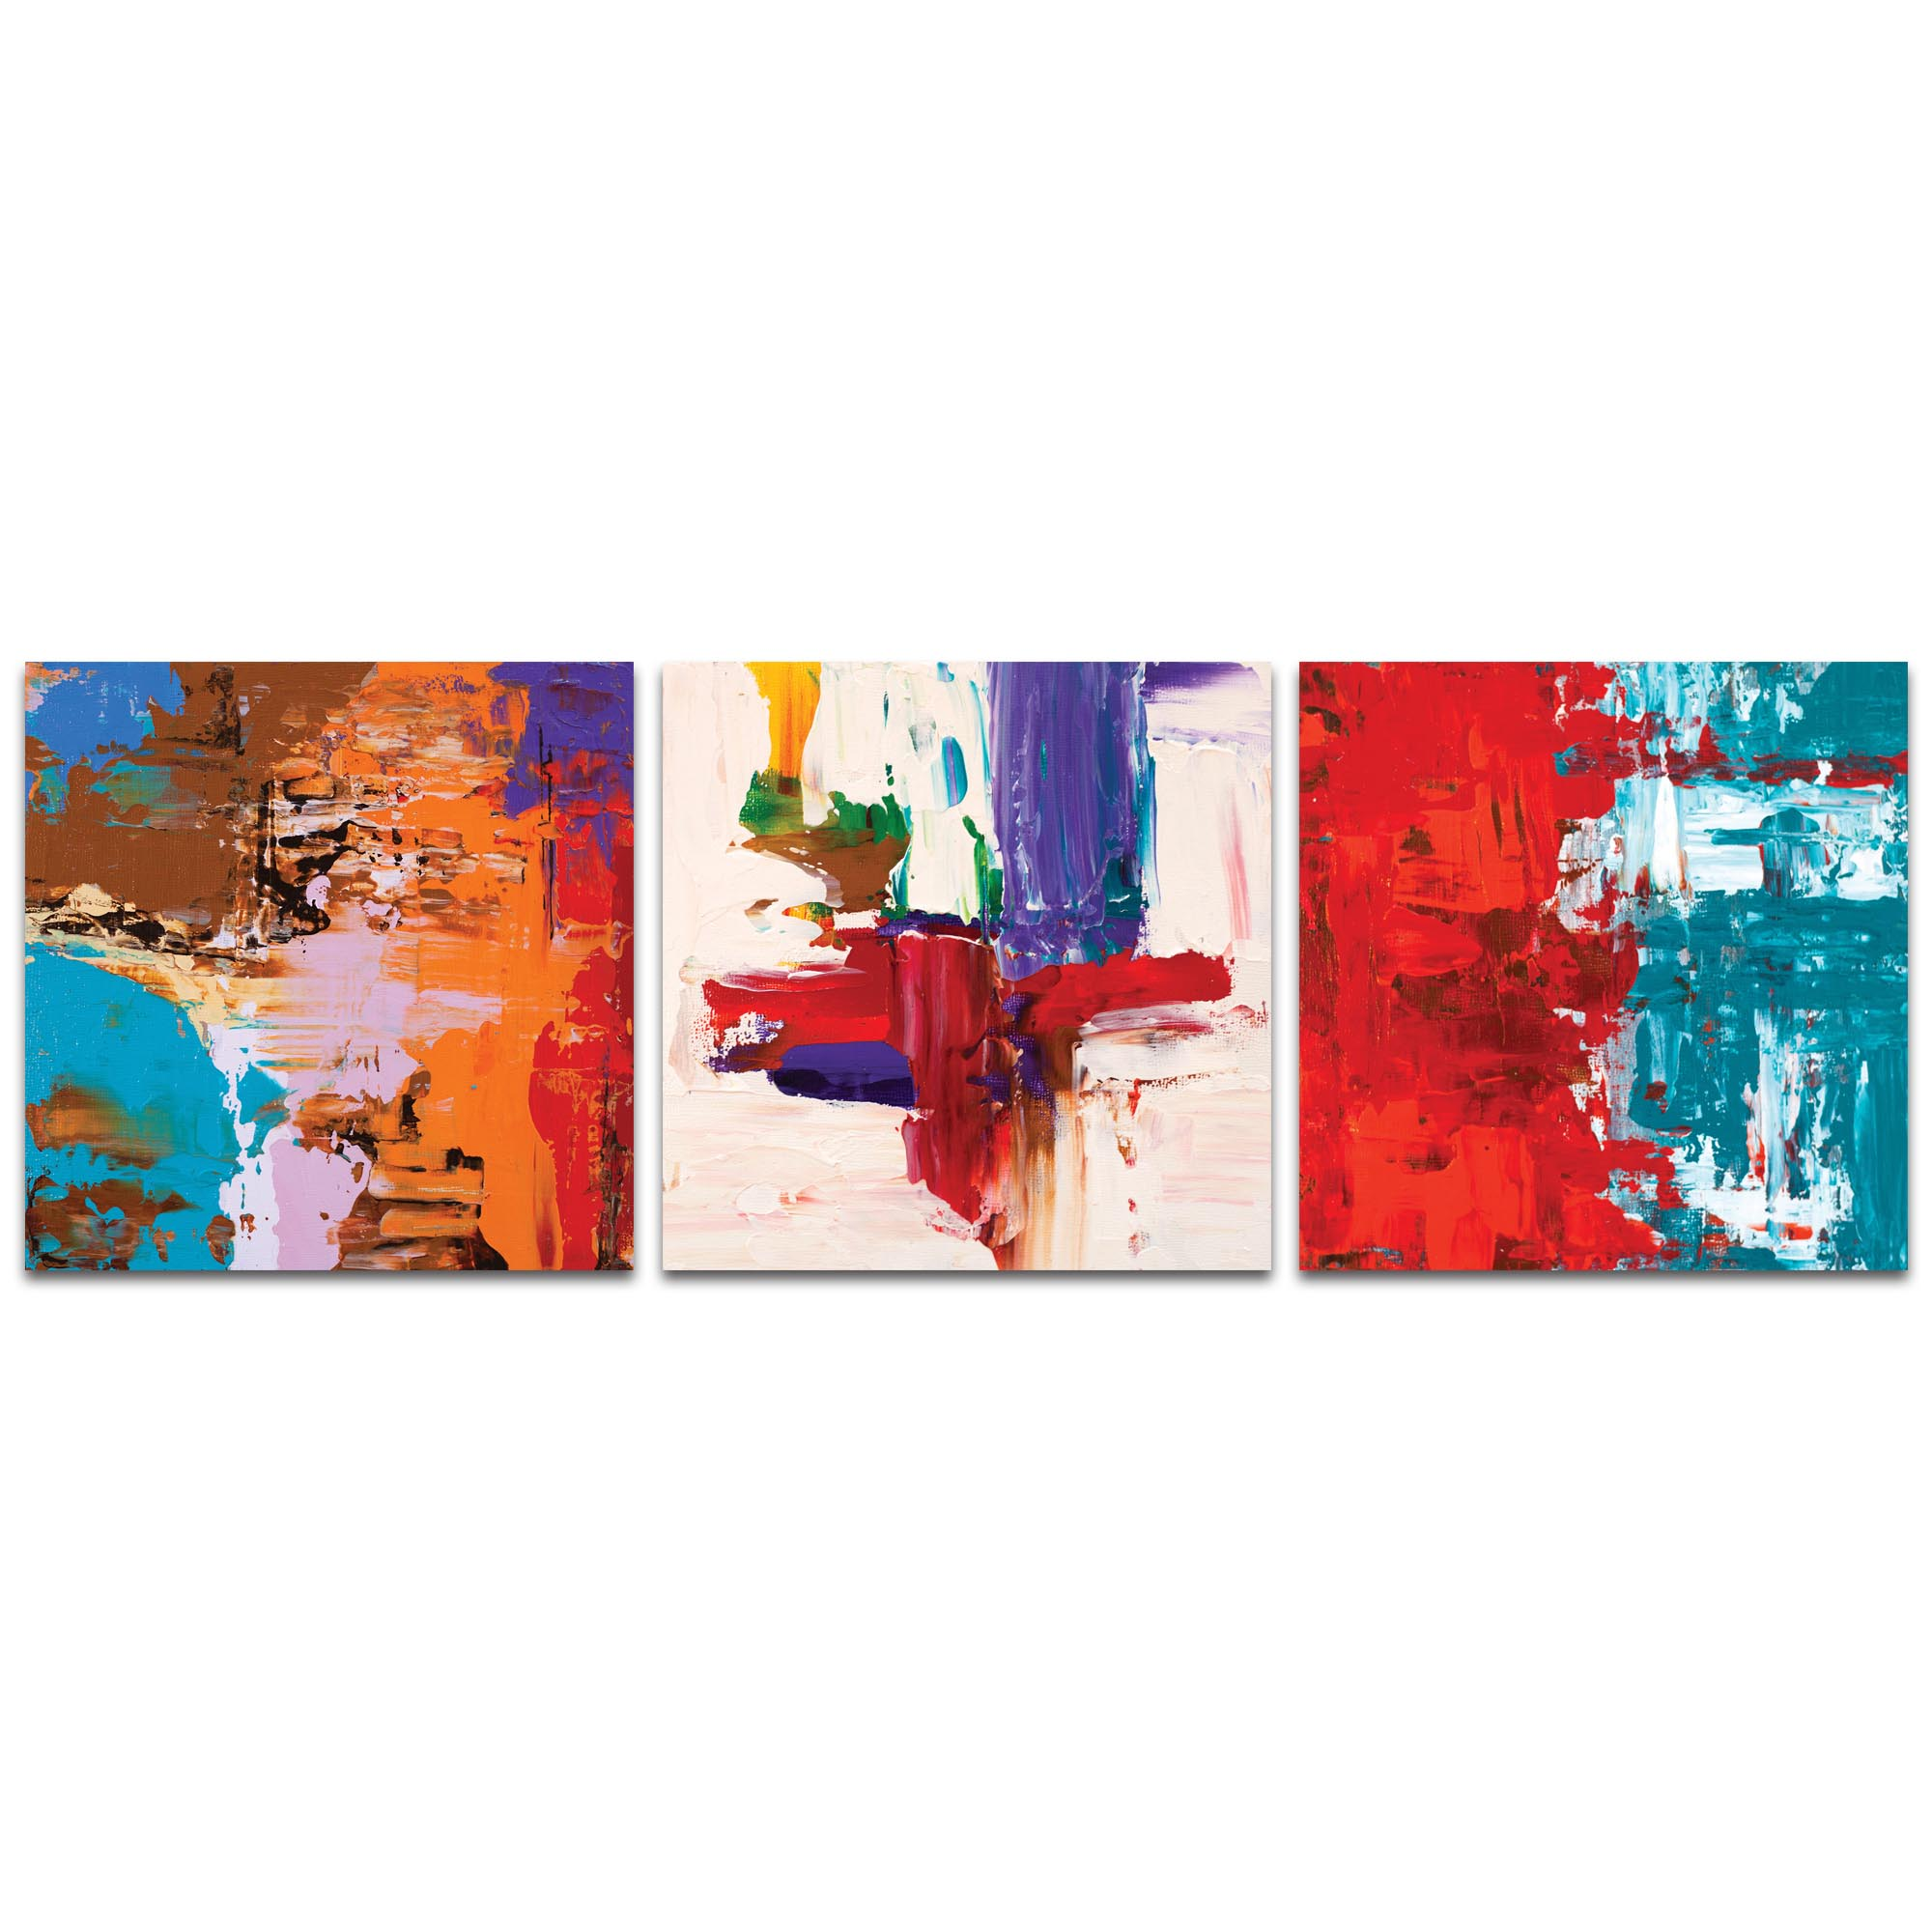 Abstract Wall Art 'Urban Triptych 5' - Urban Decor on Metal or Plexiglass